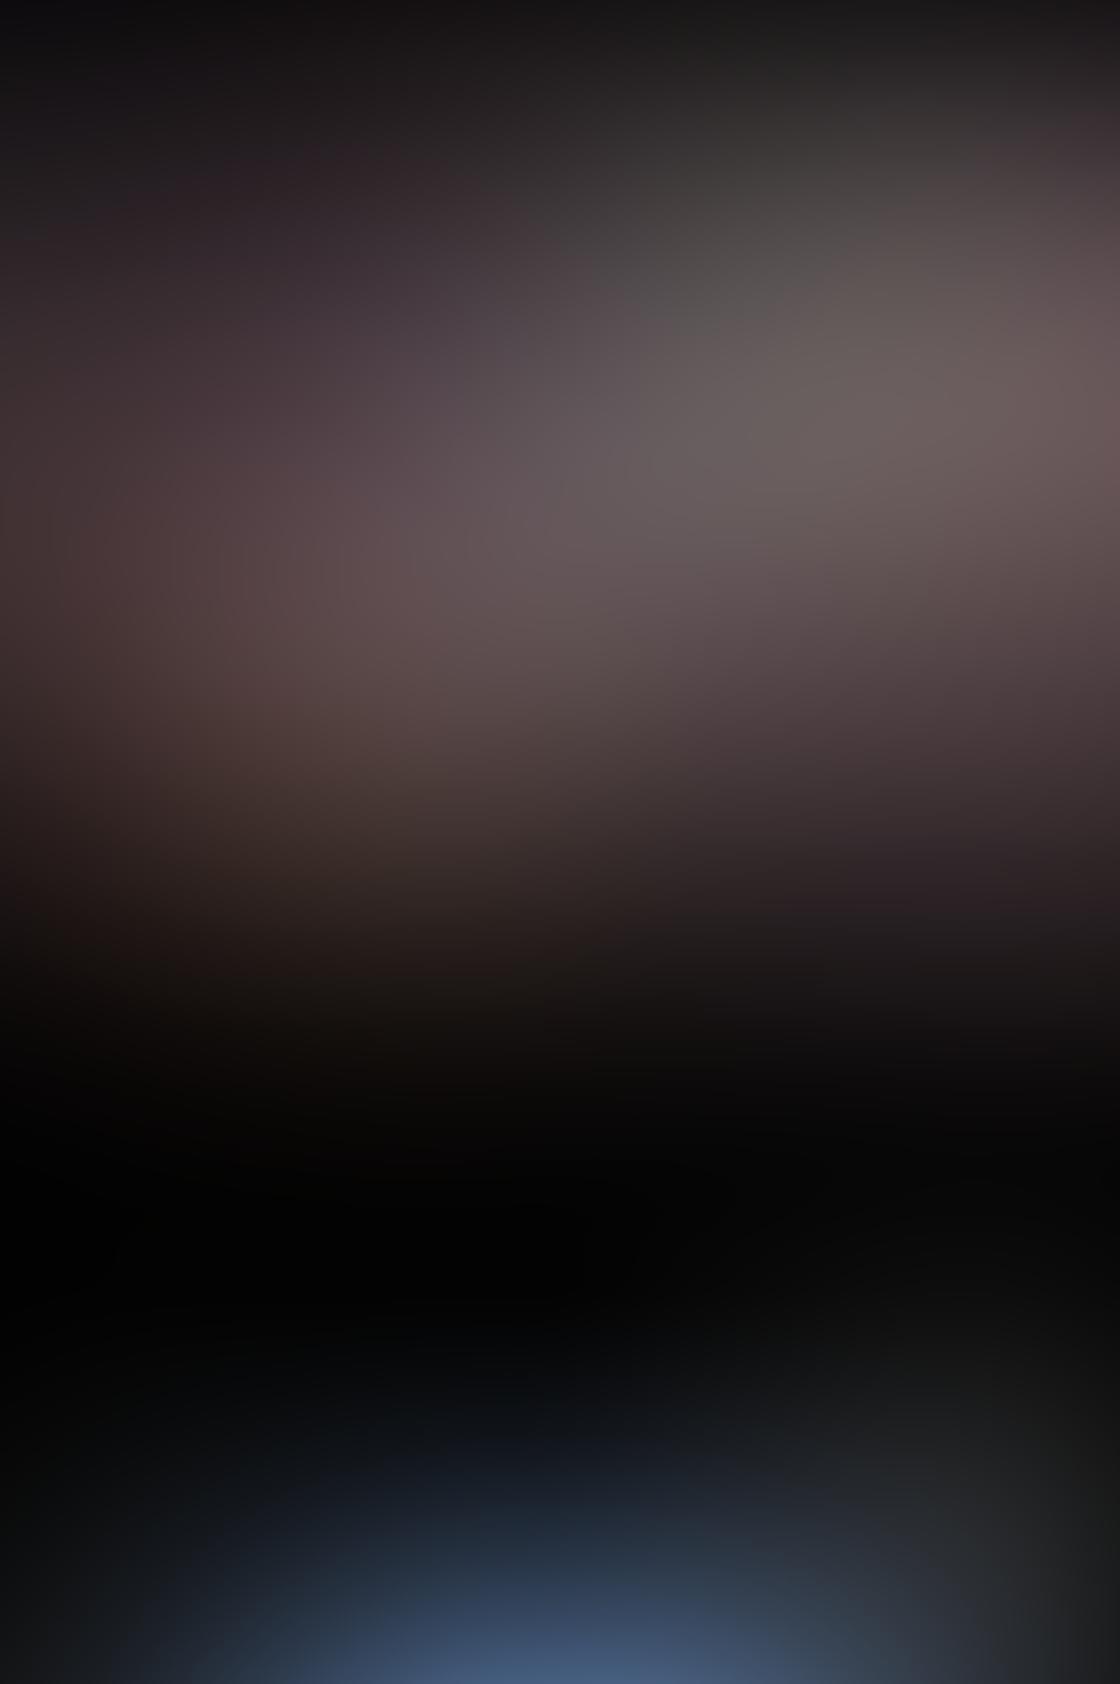 Priime App iPhone Photo Editing 8